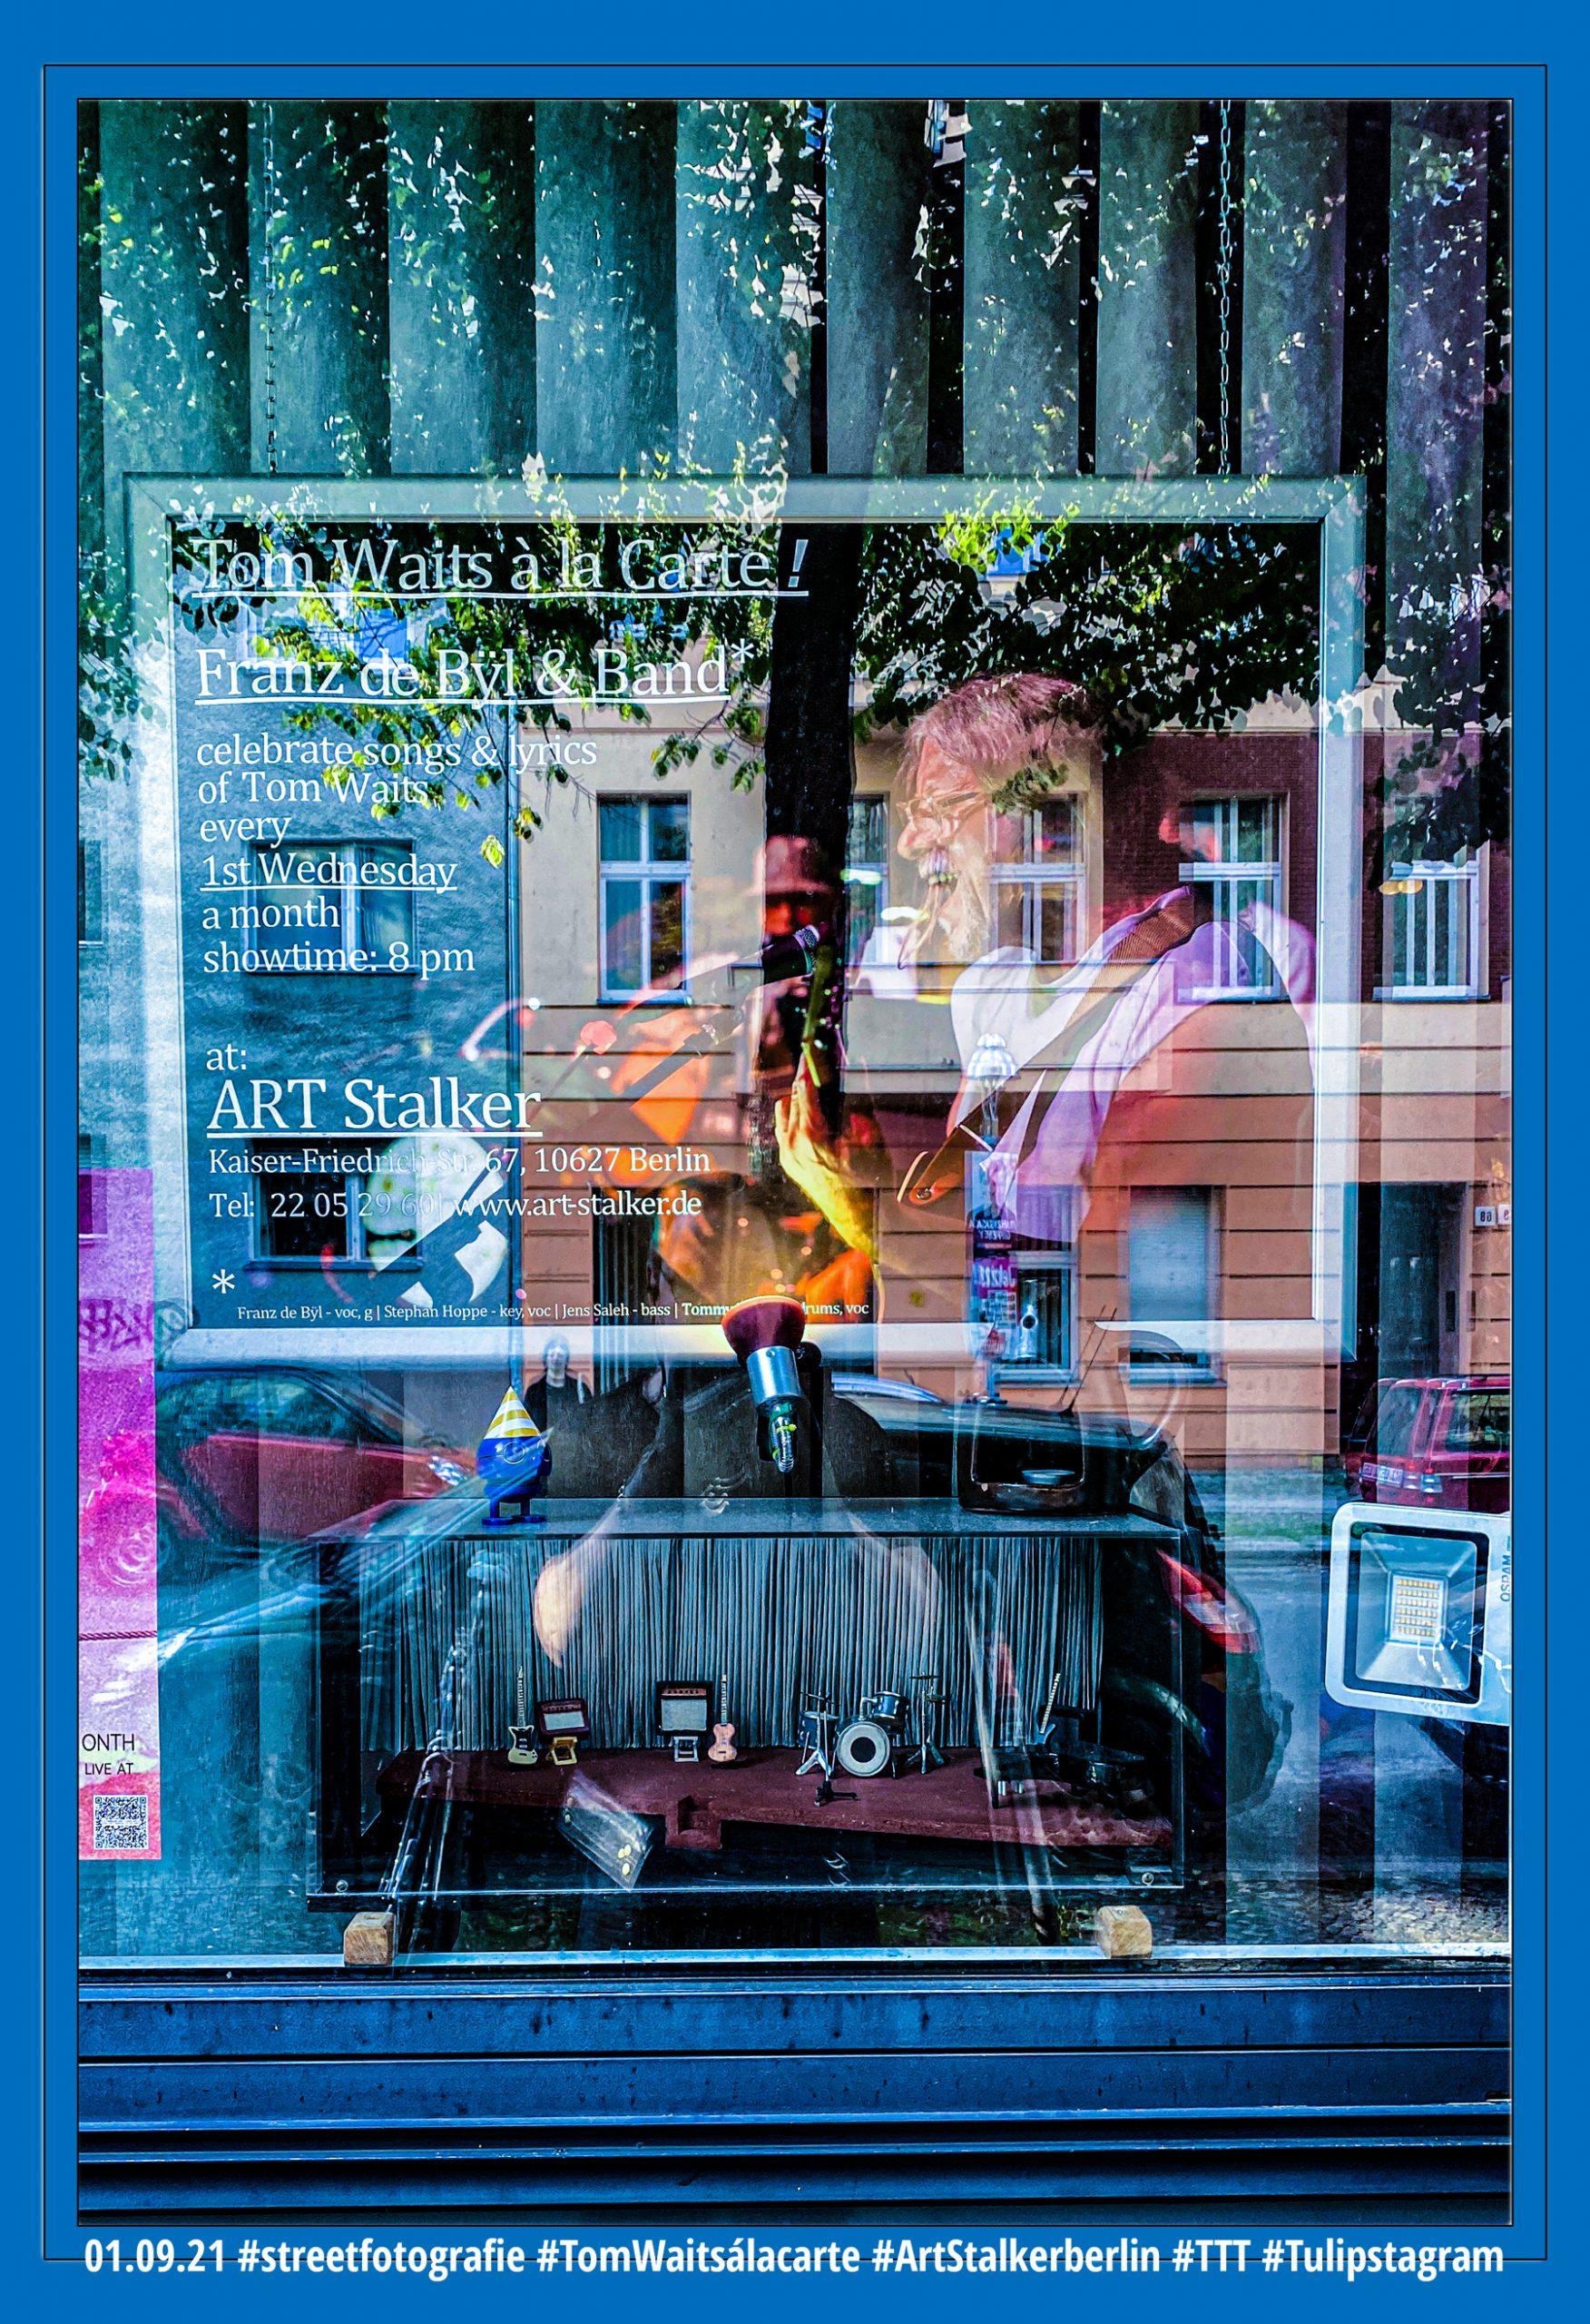 01.09.21 #streetfotografie #TomWaitsálacarte #ArtStalkerberlin #TTT #Tulipstagram